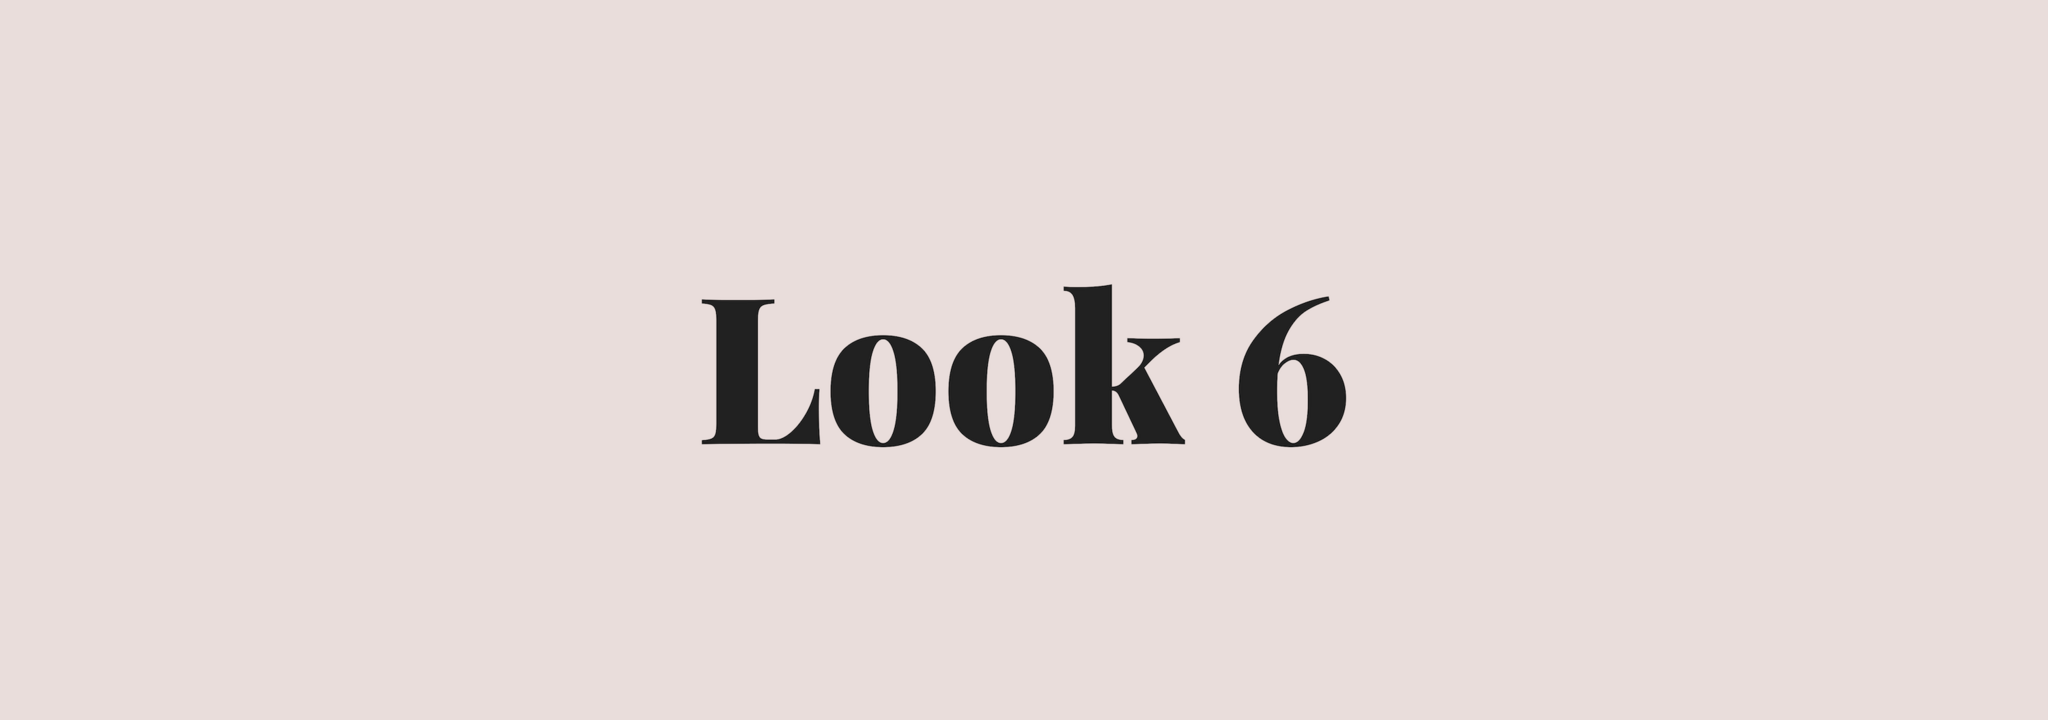 look 6